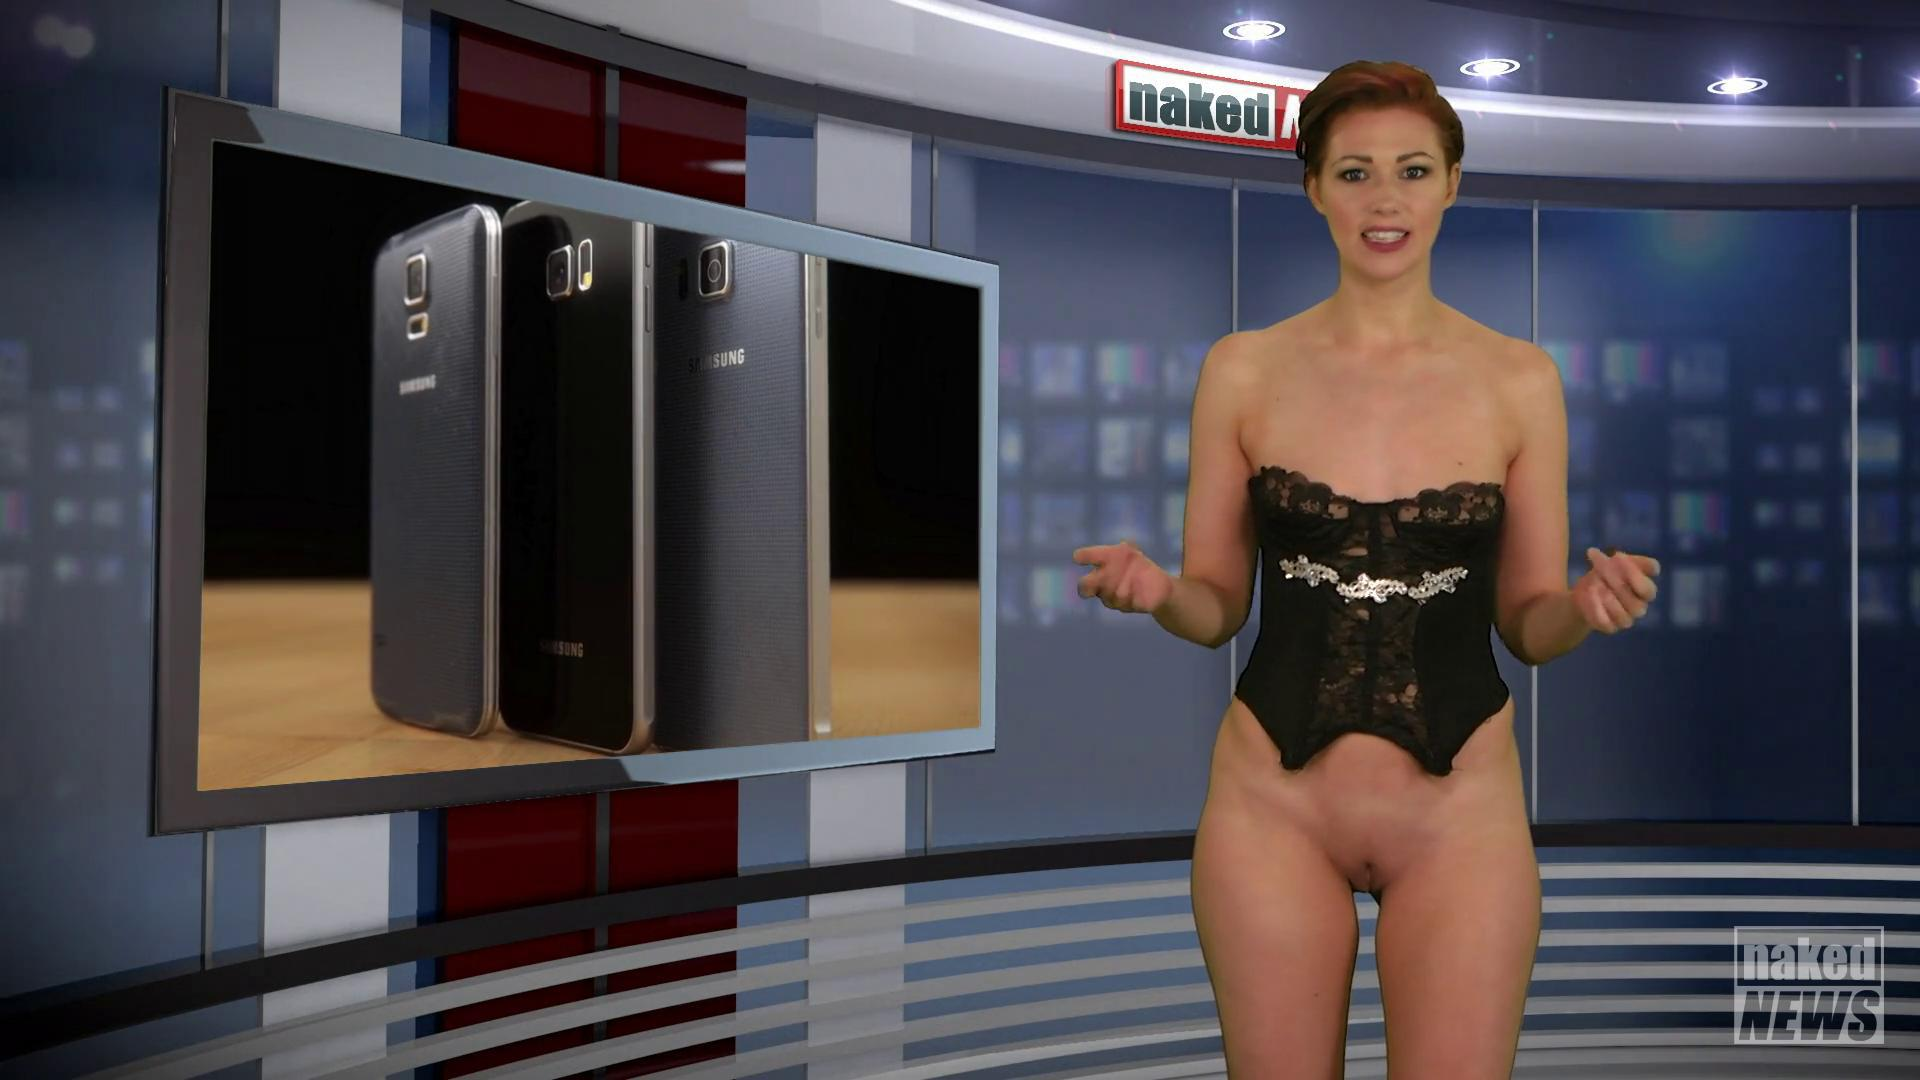 Naked news shoot face